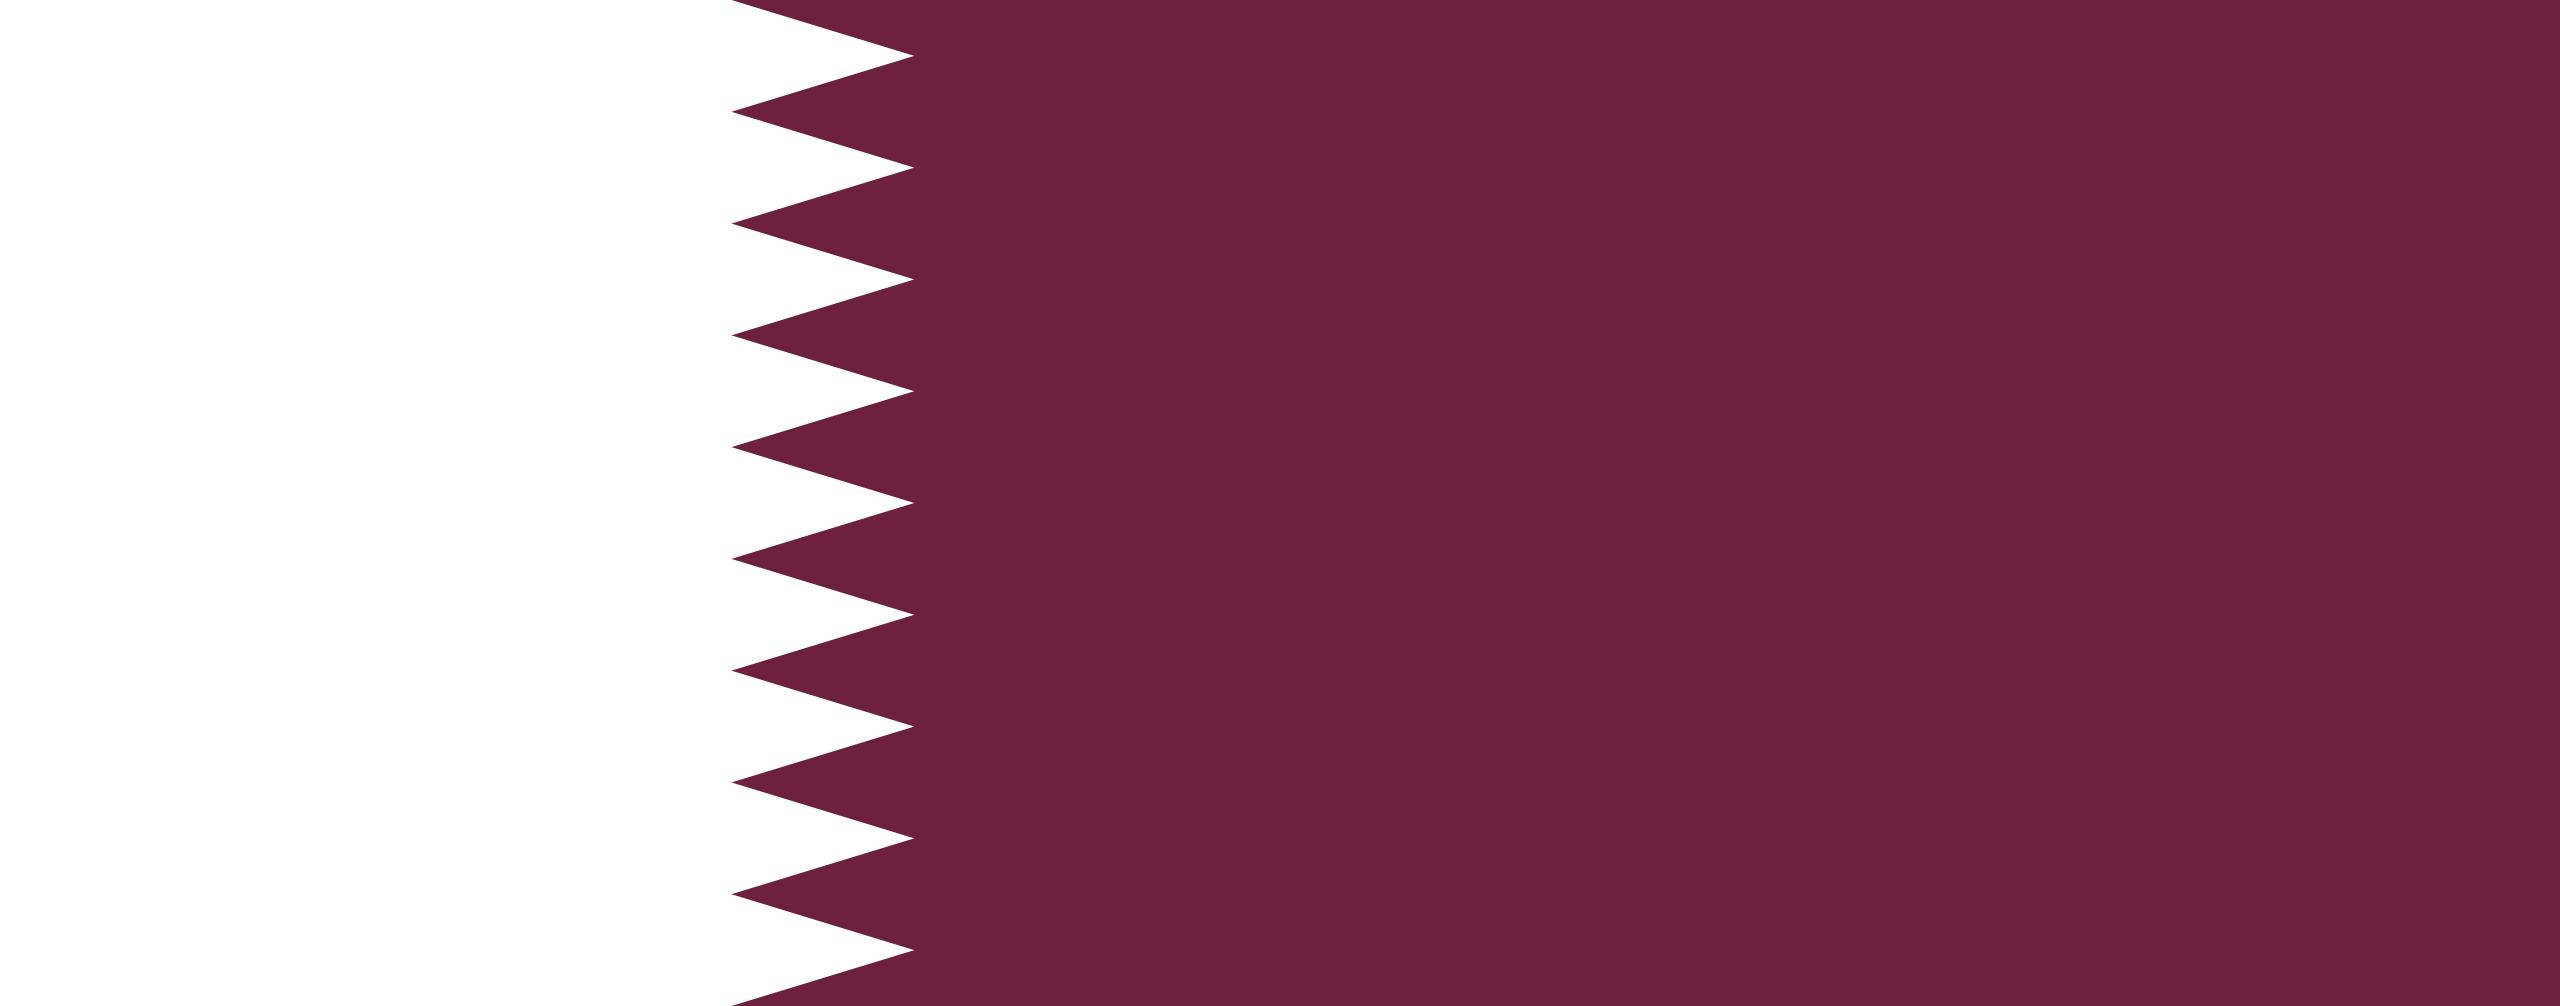 qatar, 国家, 会徽, 徽标, 符号 - 高清壁纸 - 教授-falken.com